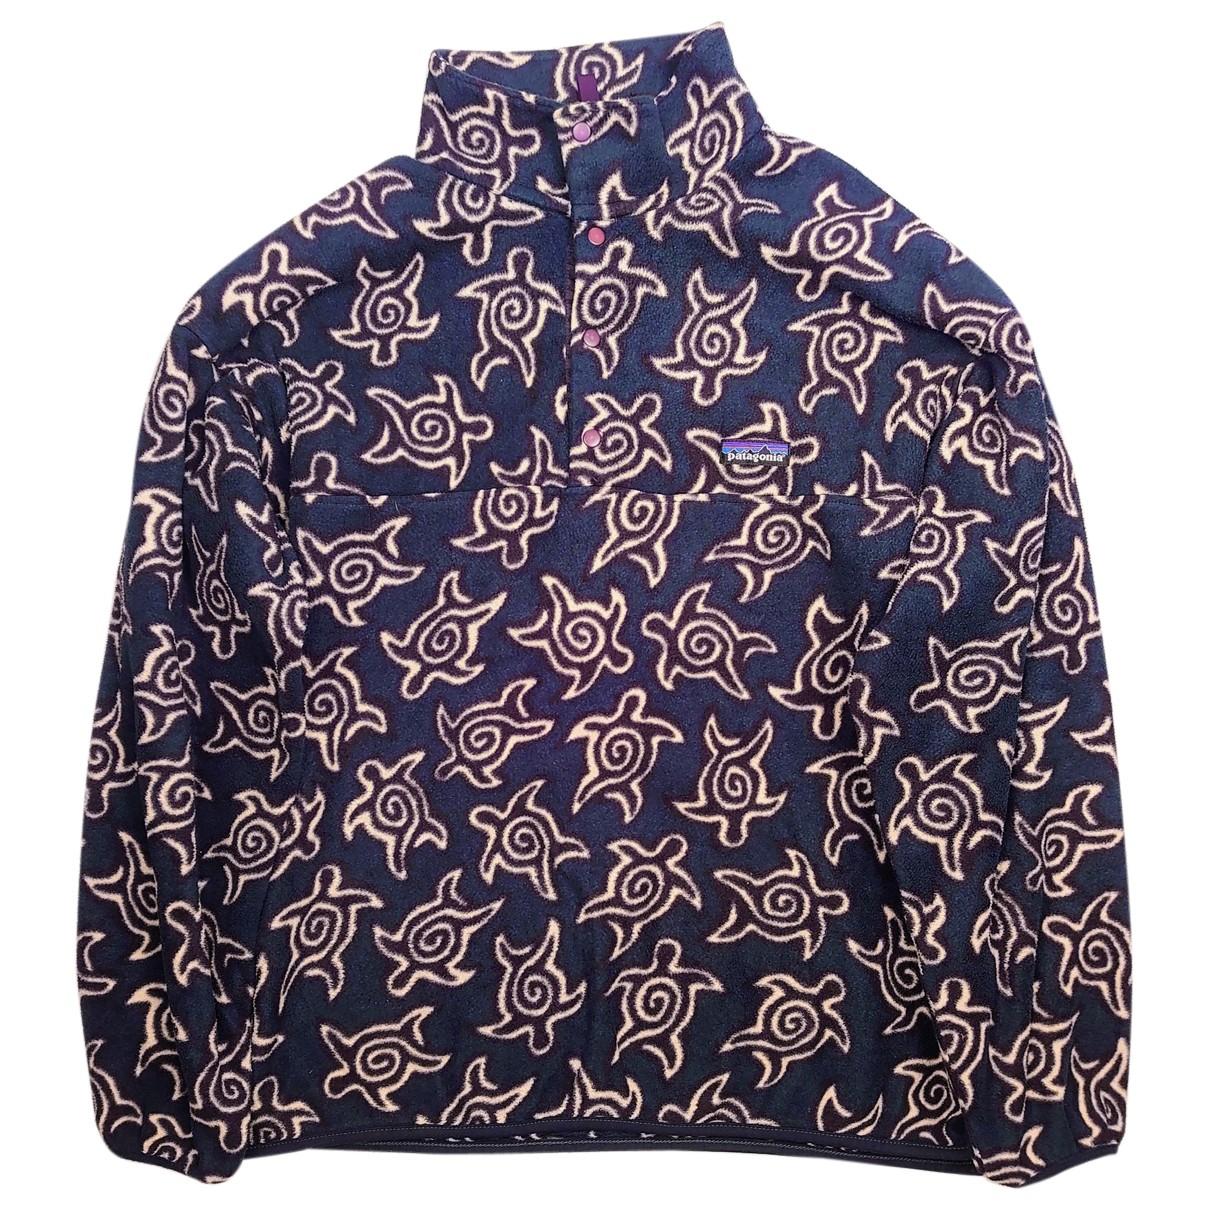 Patagonia N Multicolour Knitwear & Sweatshirts for Men L International